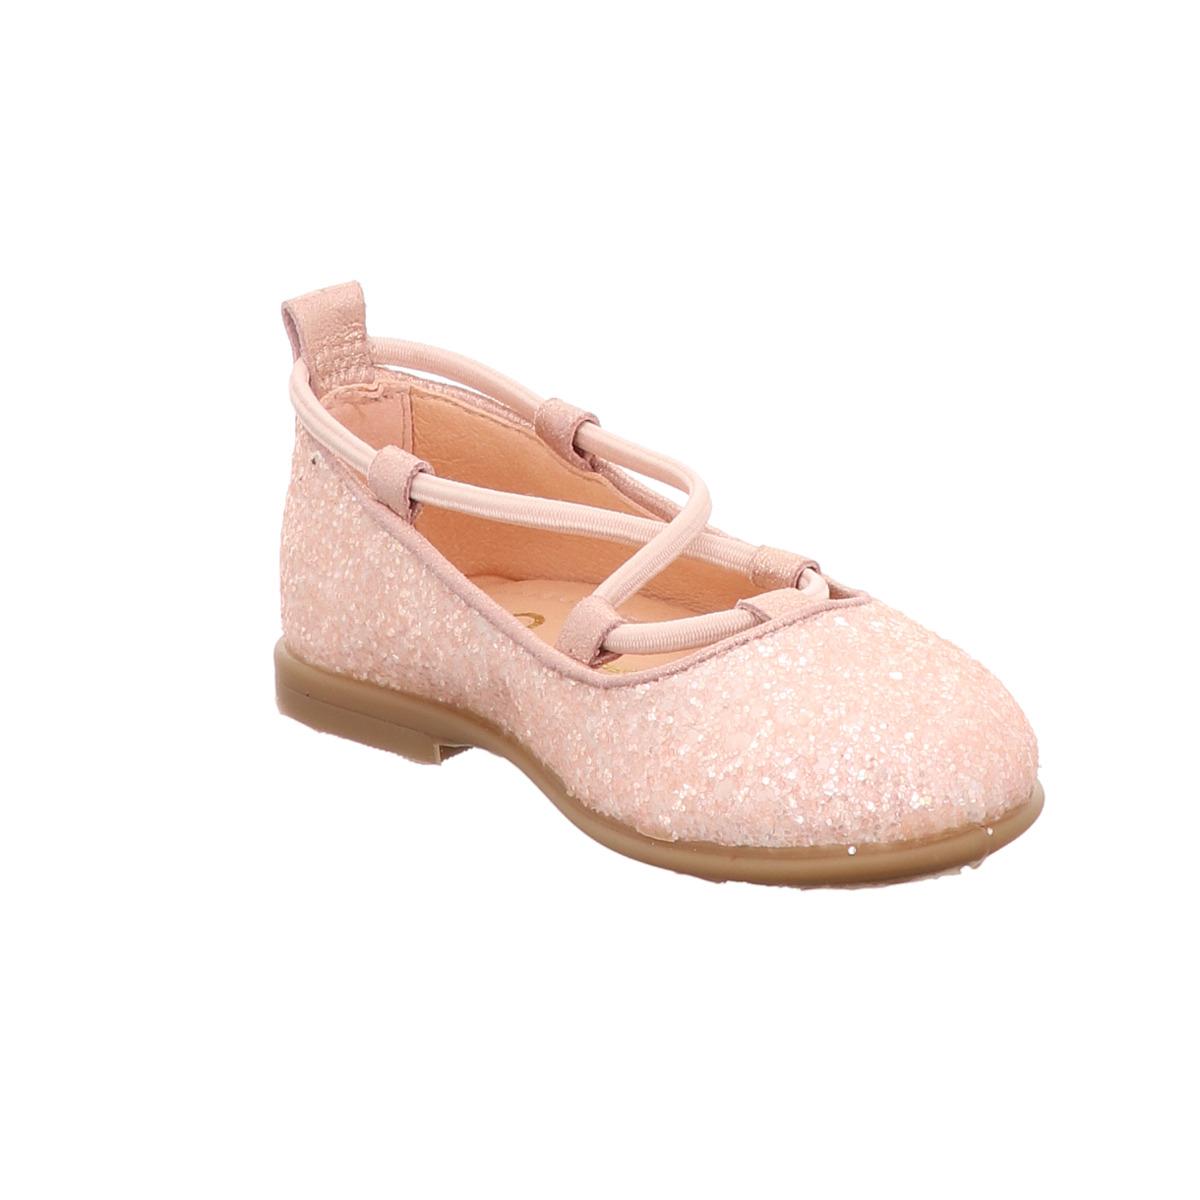 Mä. Ballerina, Seimy Unisa Leder Textil kombi Rosa